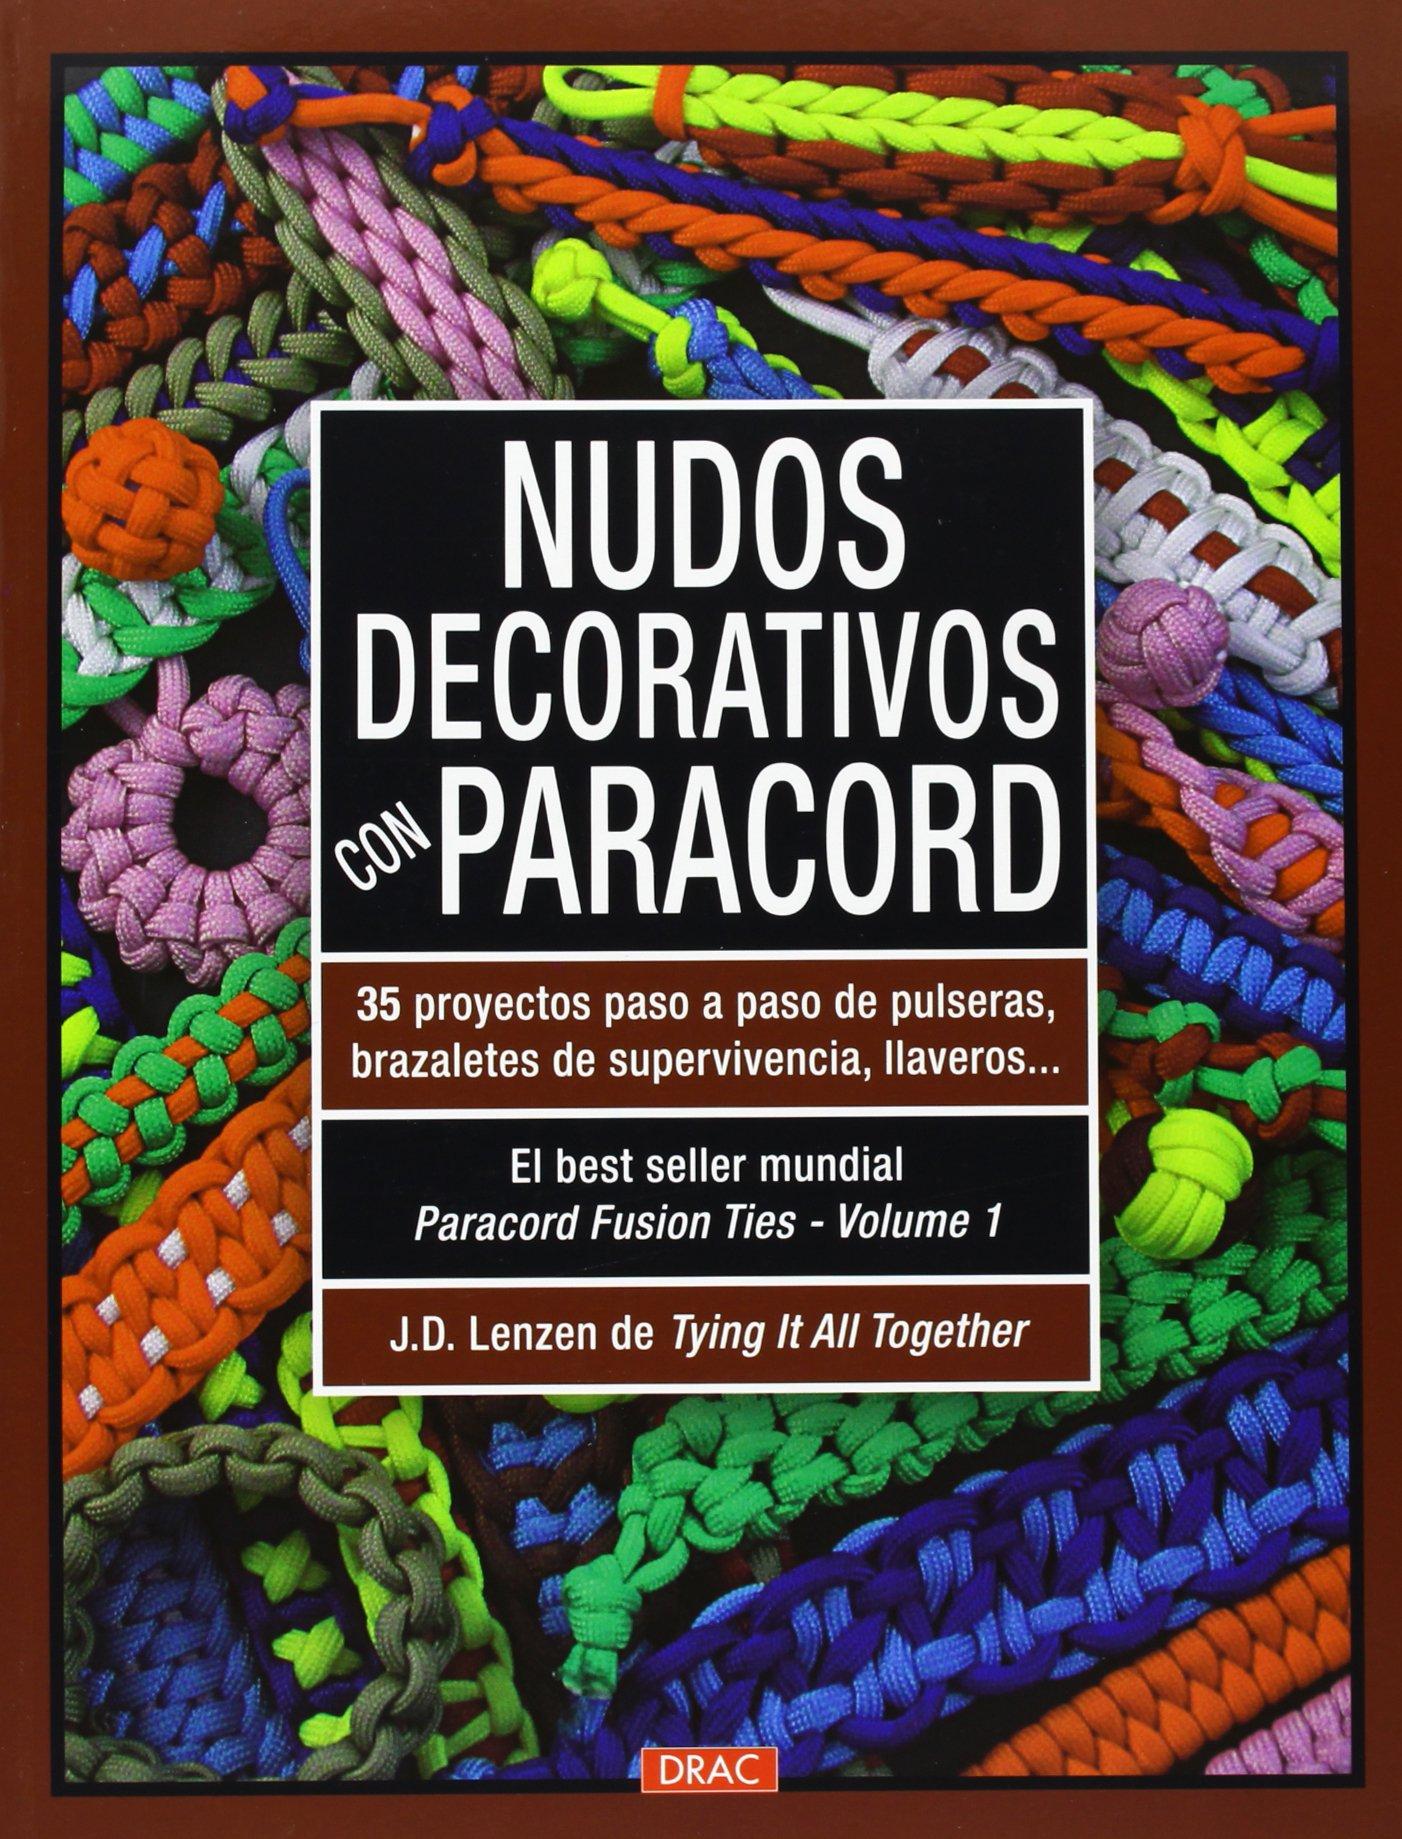 Nudos decorativos con paracord: 35 proyectos paso a paso de ...